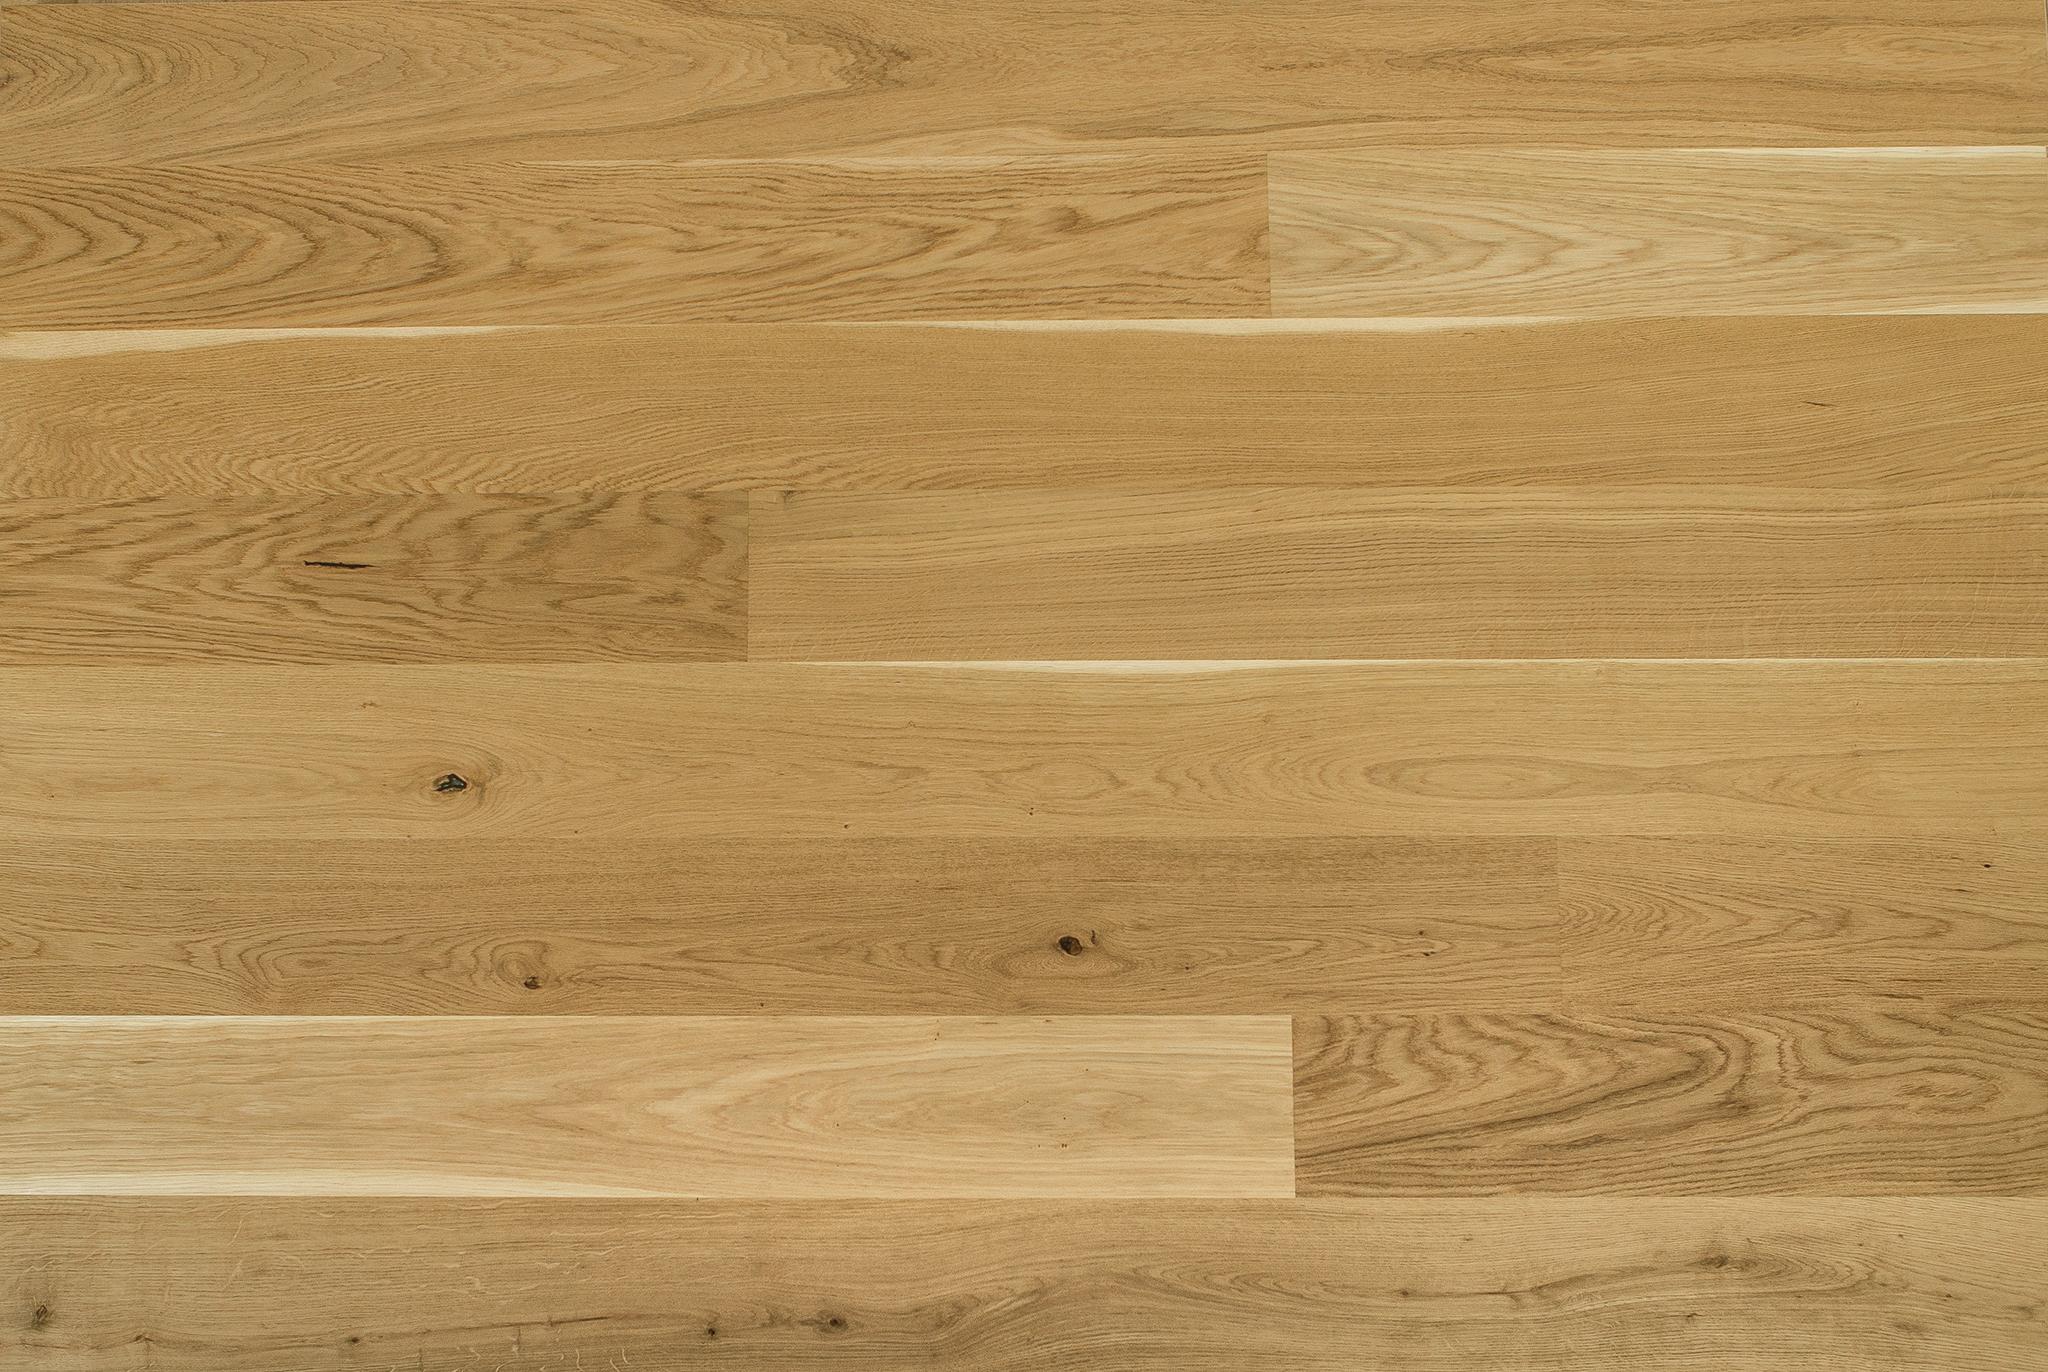 PARAT 15 Oak Trend Loc5G wideplank